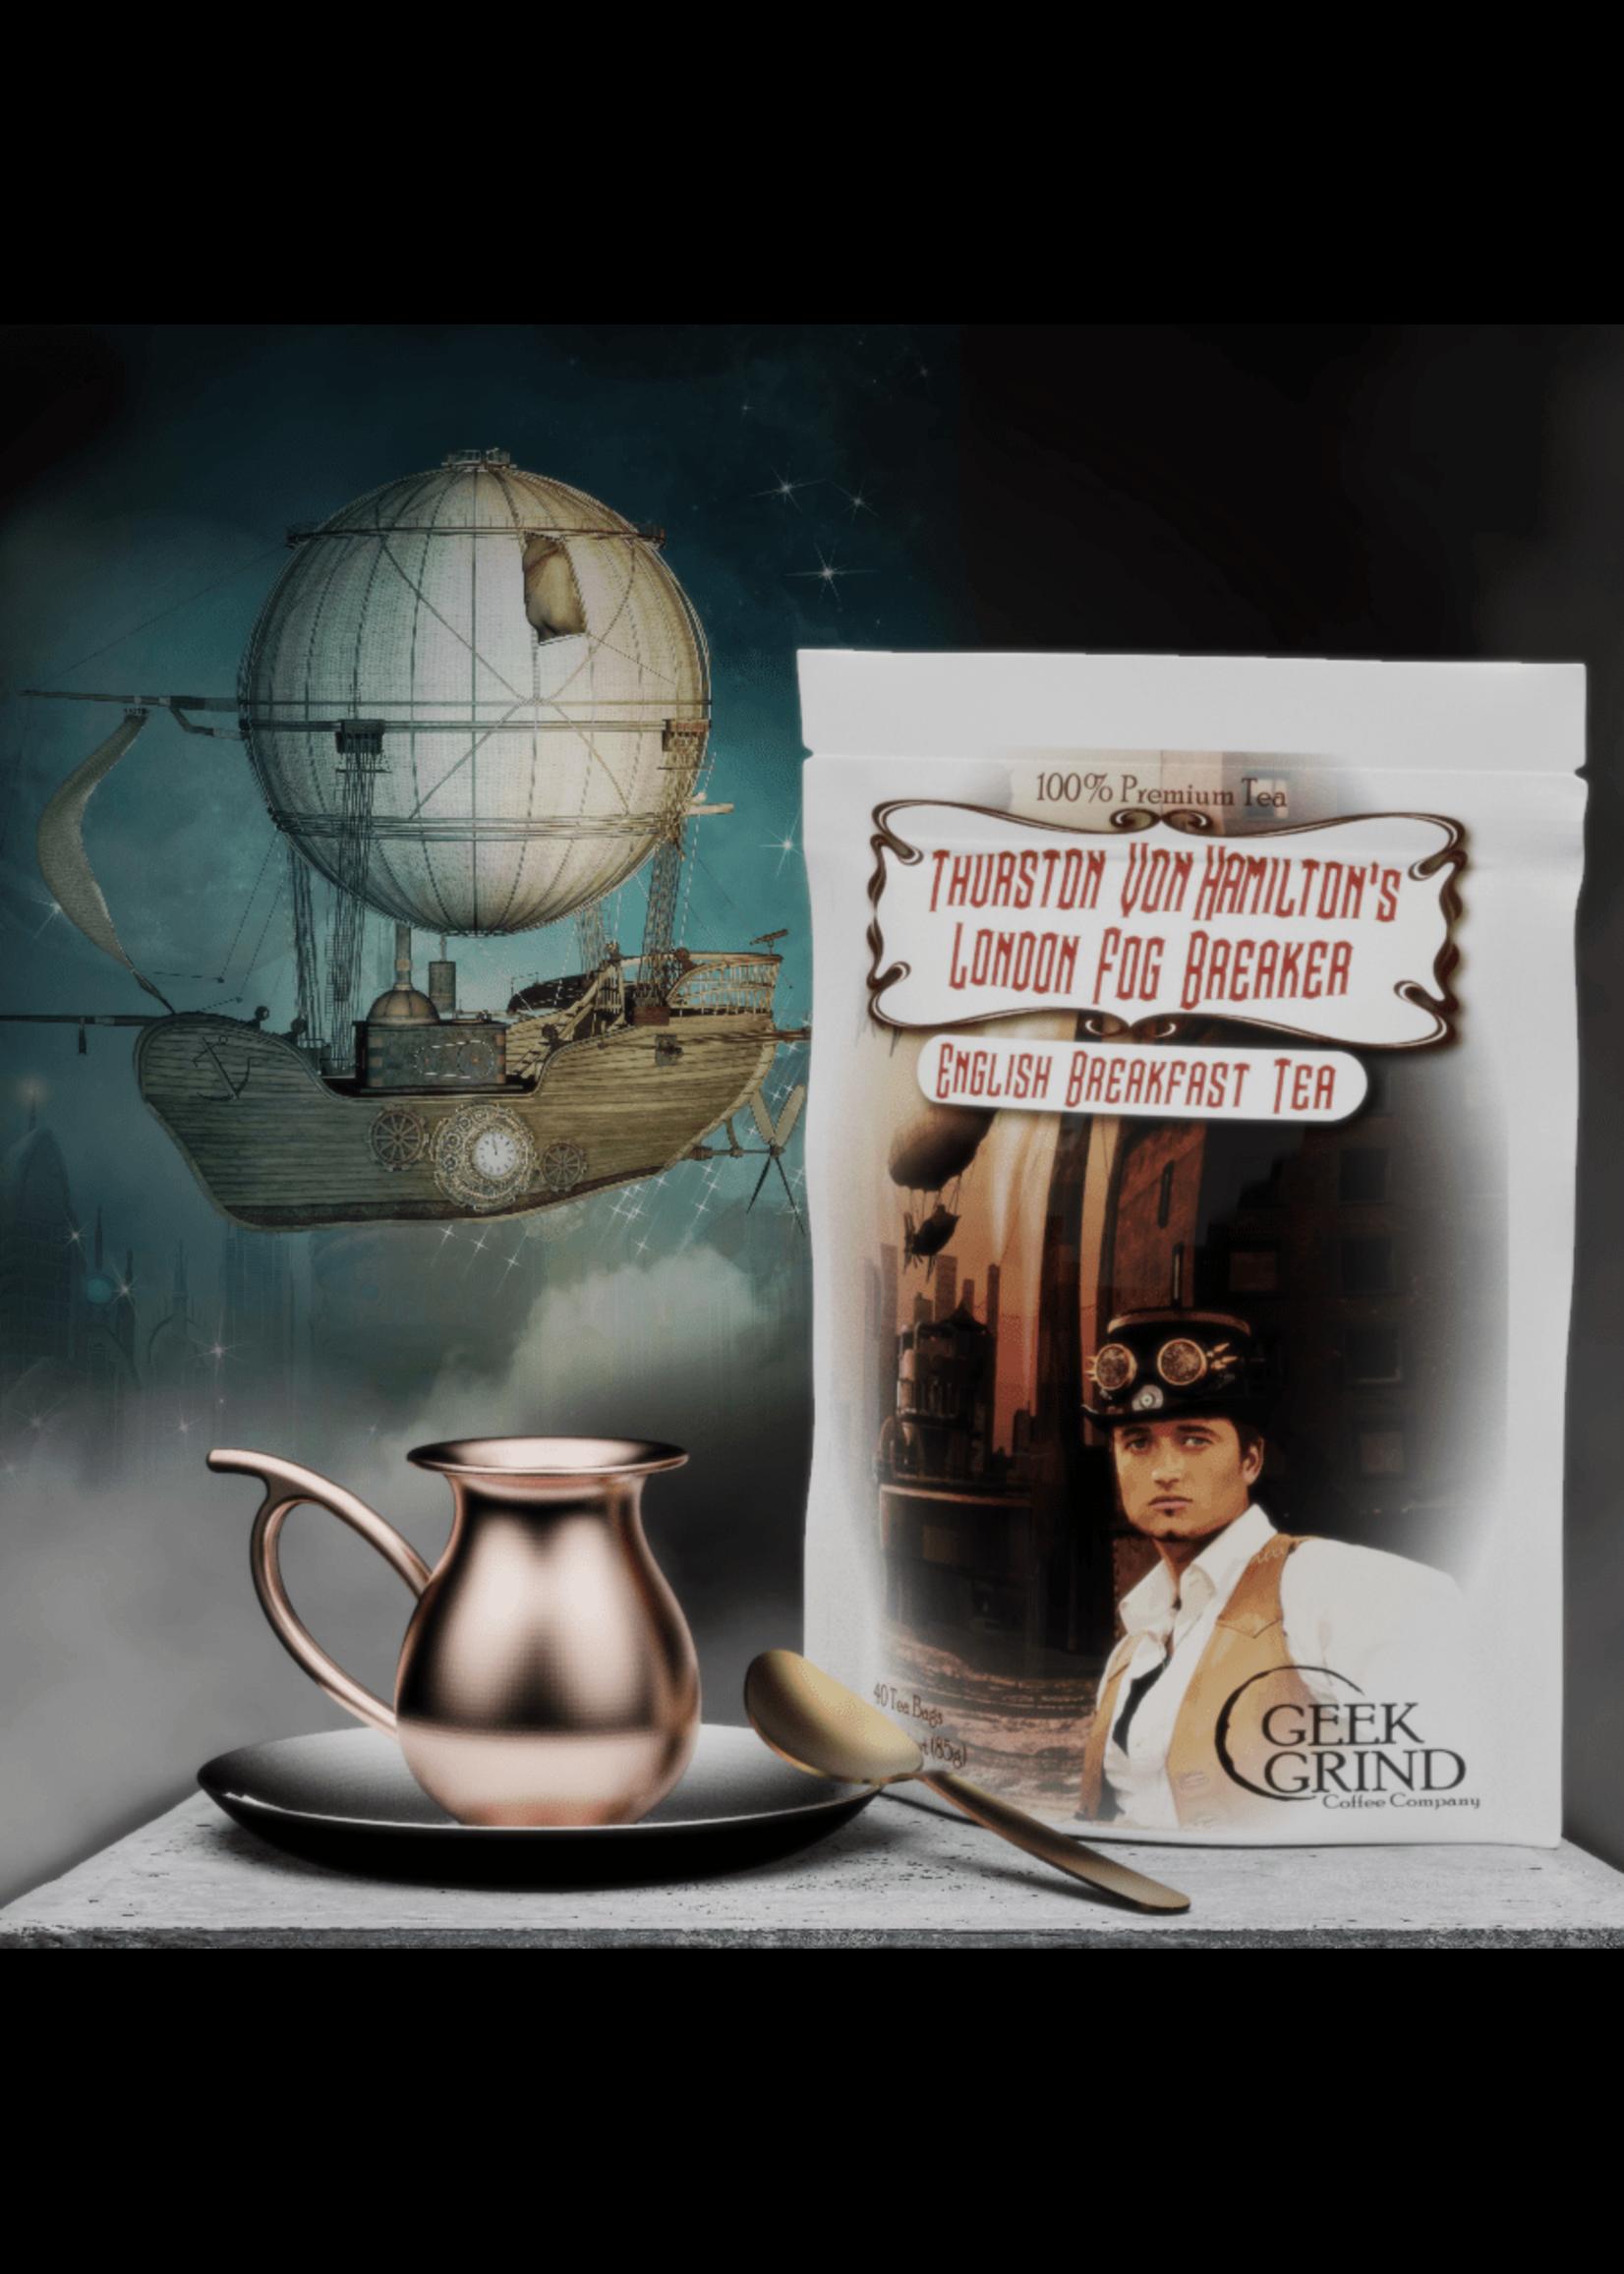 Geek Grind Thurston Von Hamilton's London Fog Breaker - English Breakfast Tea - 40 Tea Bags